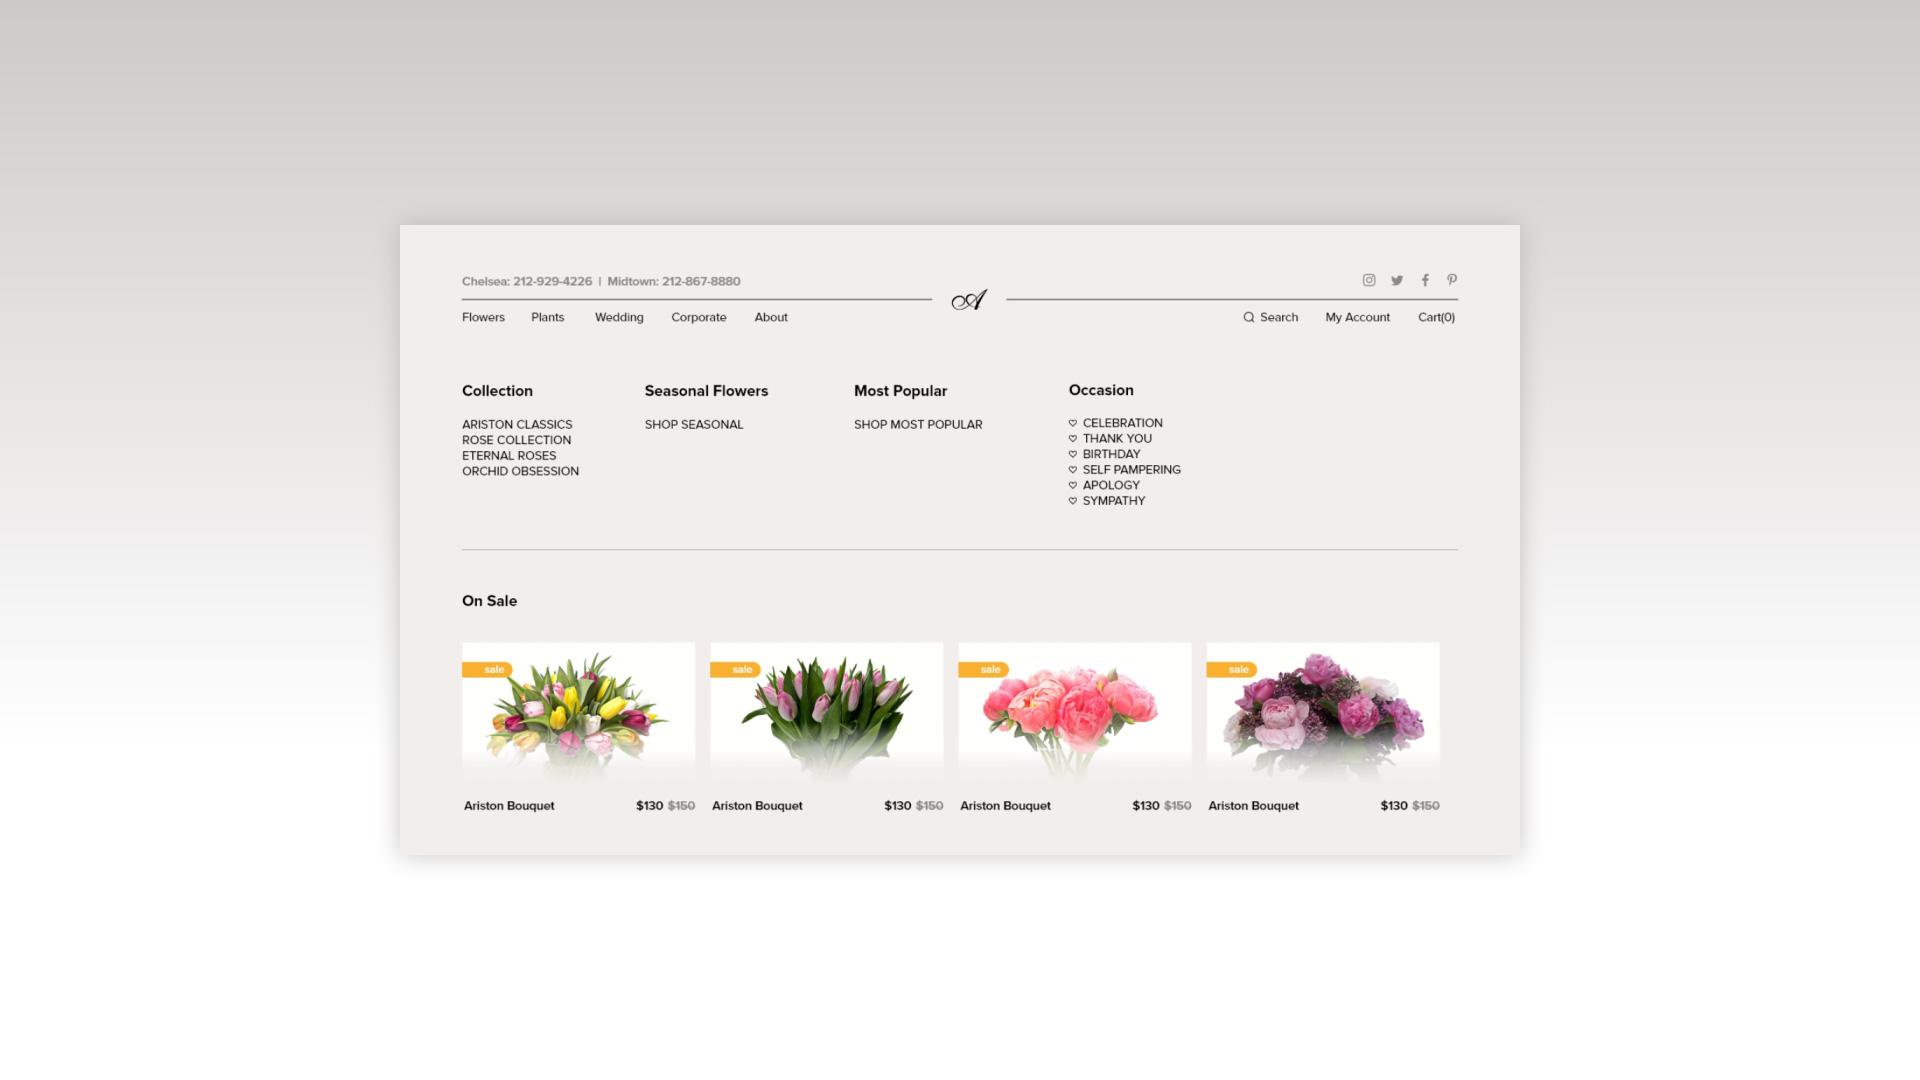 ariston flowers